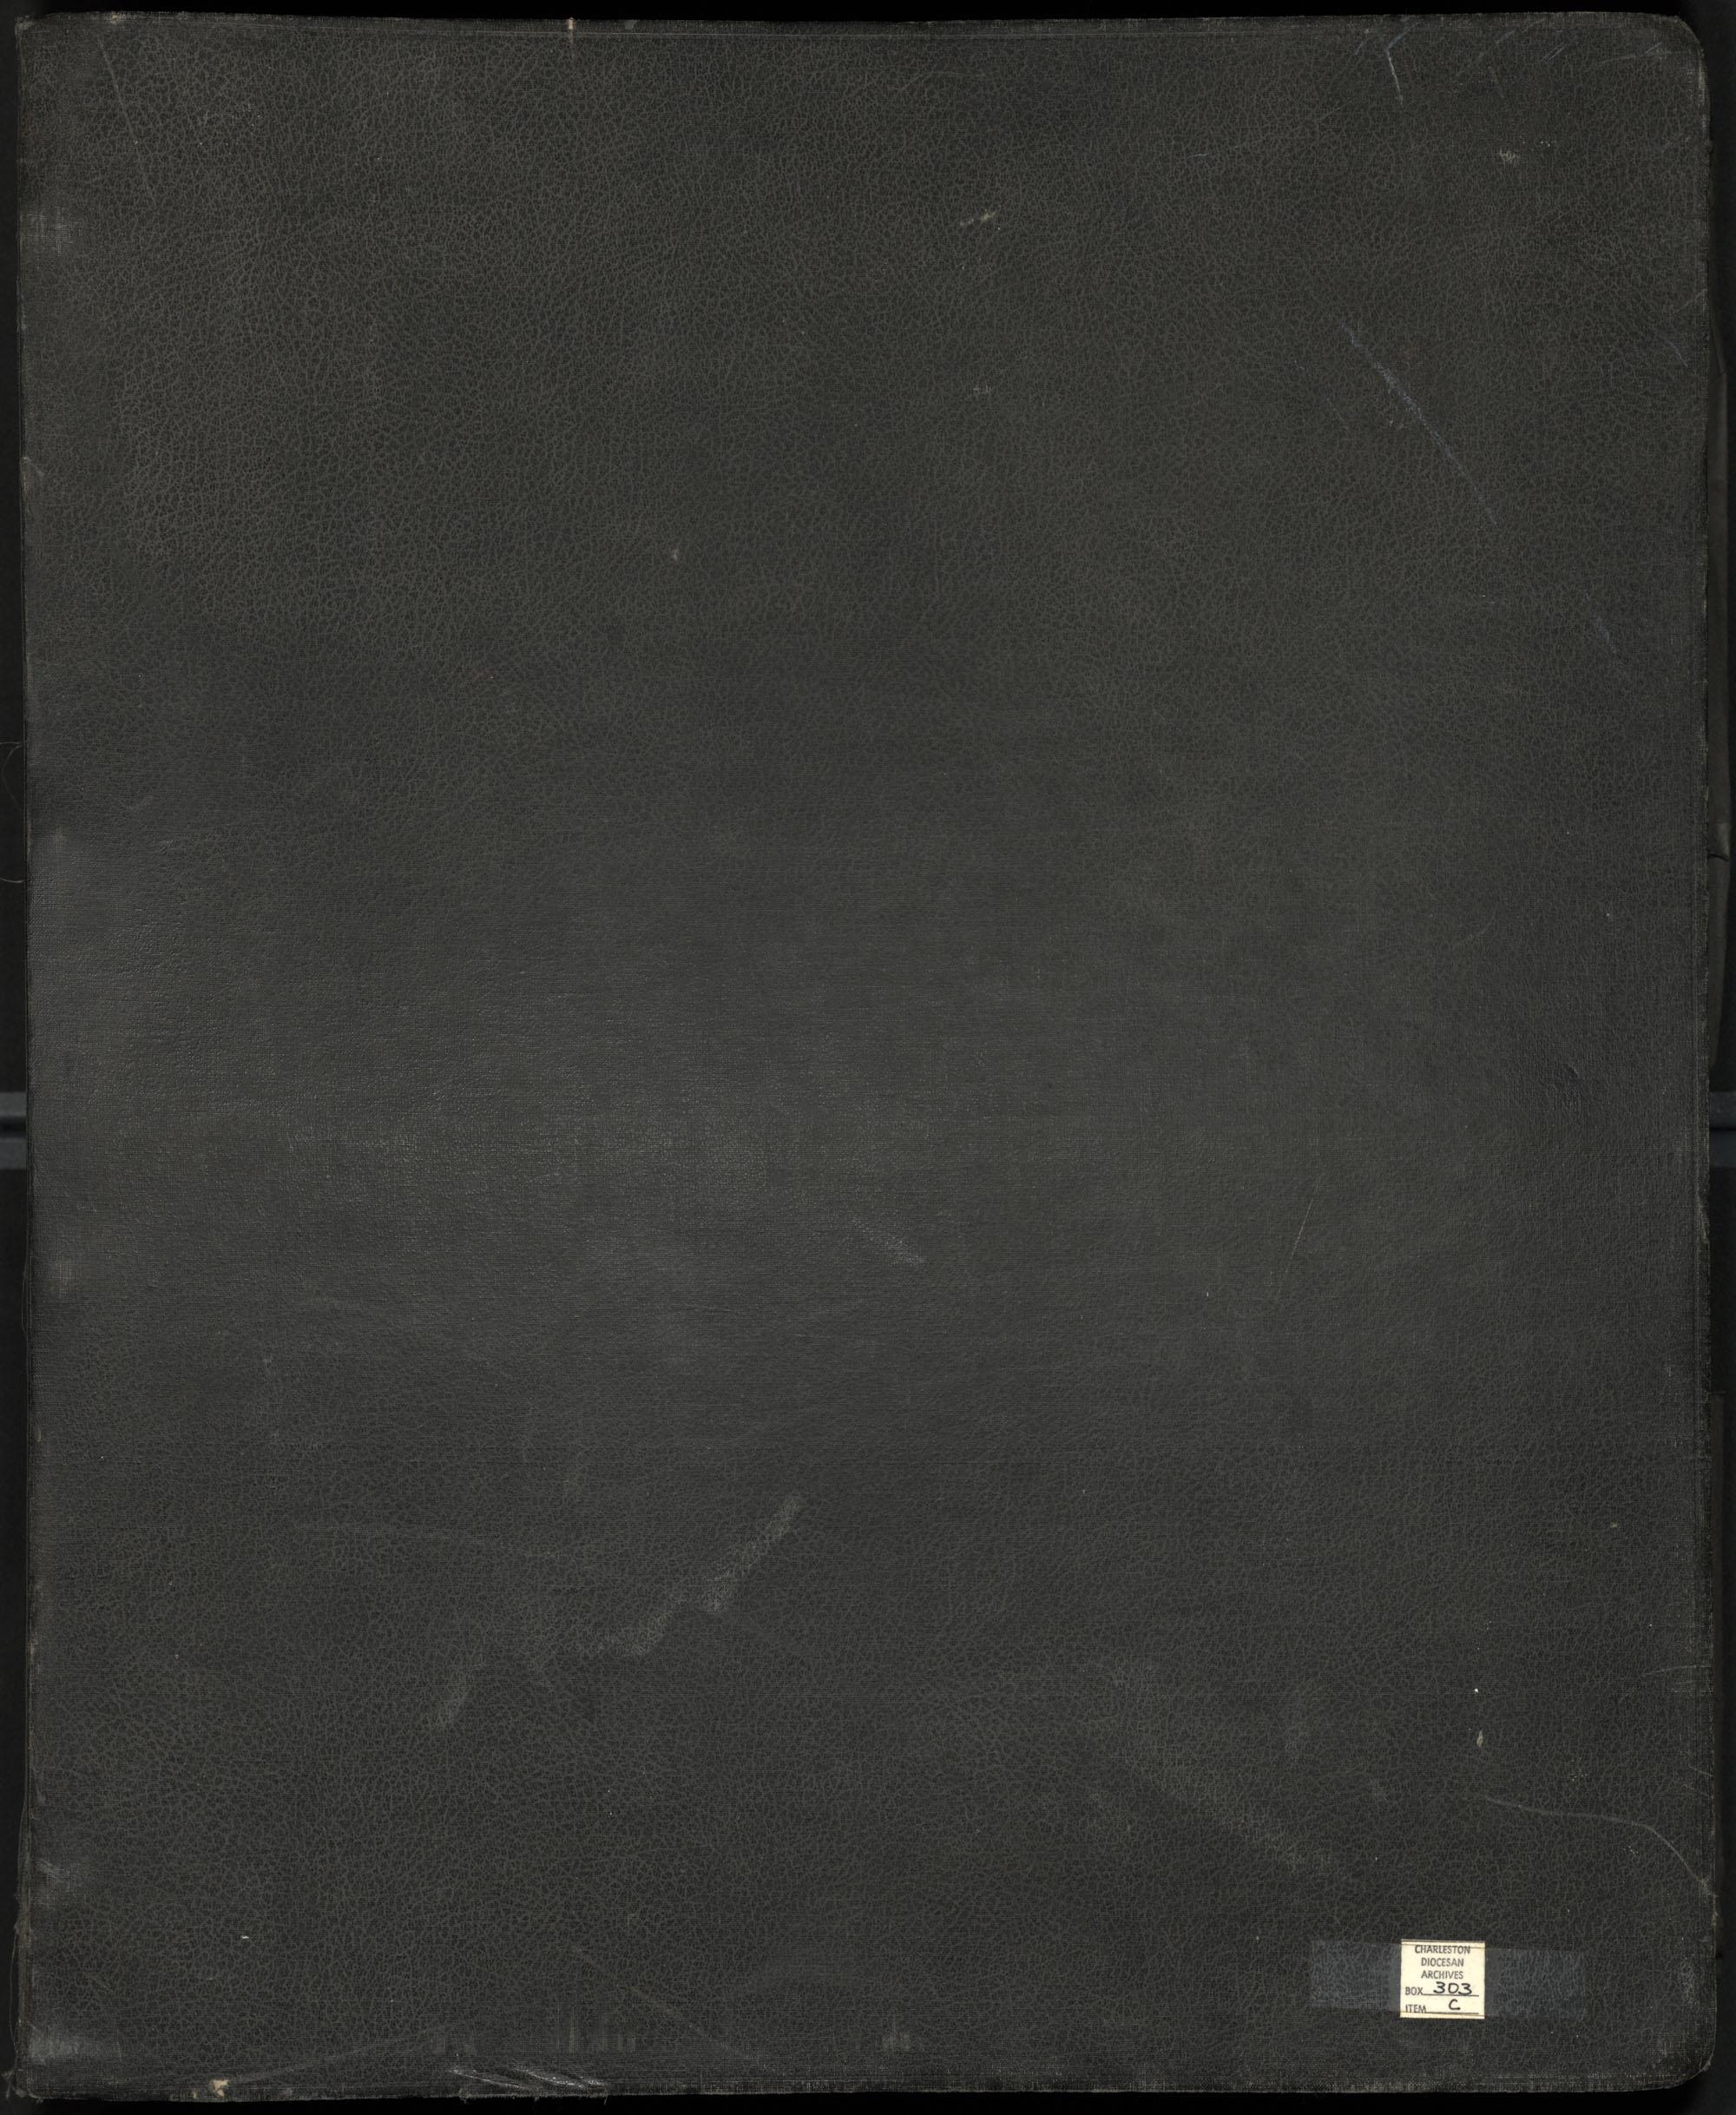 Camp St. Mary Scrapbook 3, 1950-1966